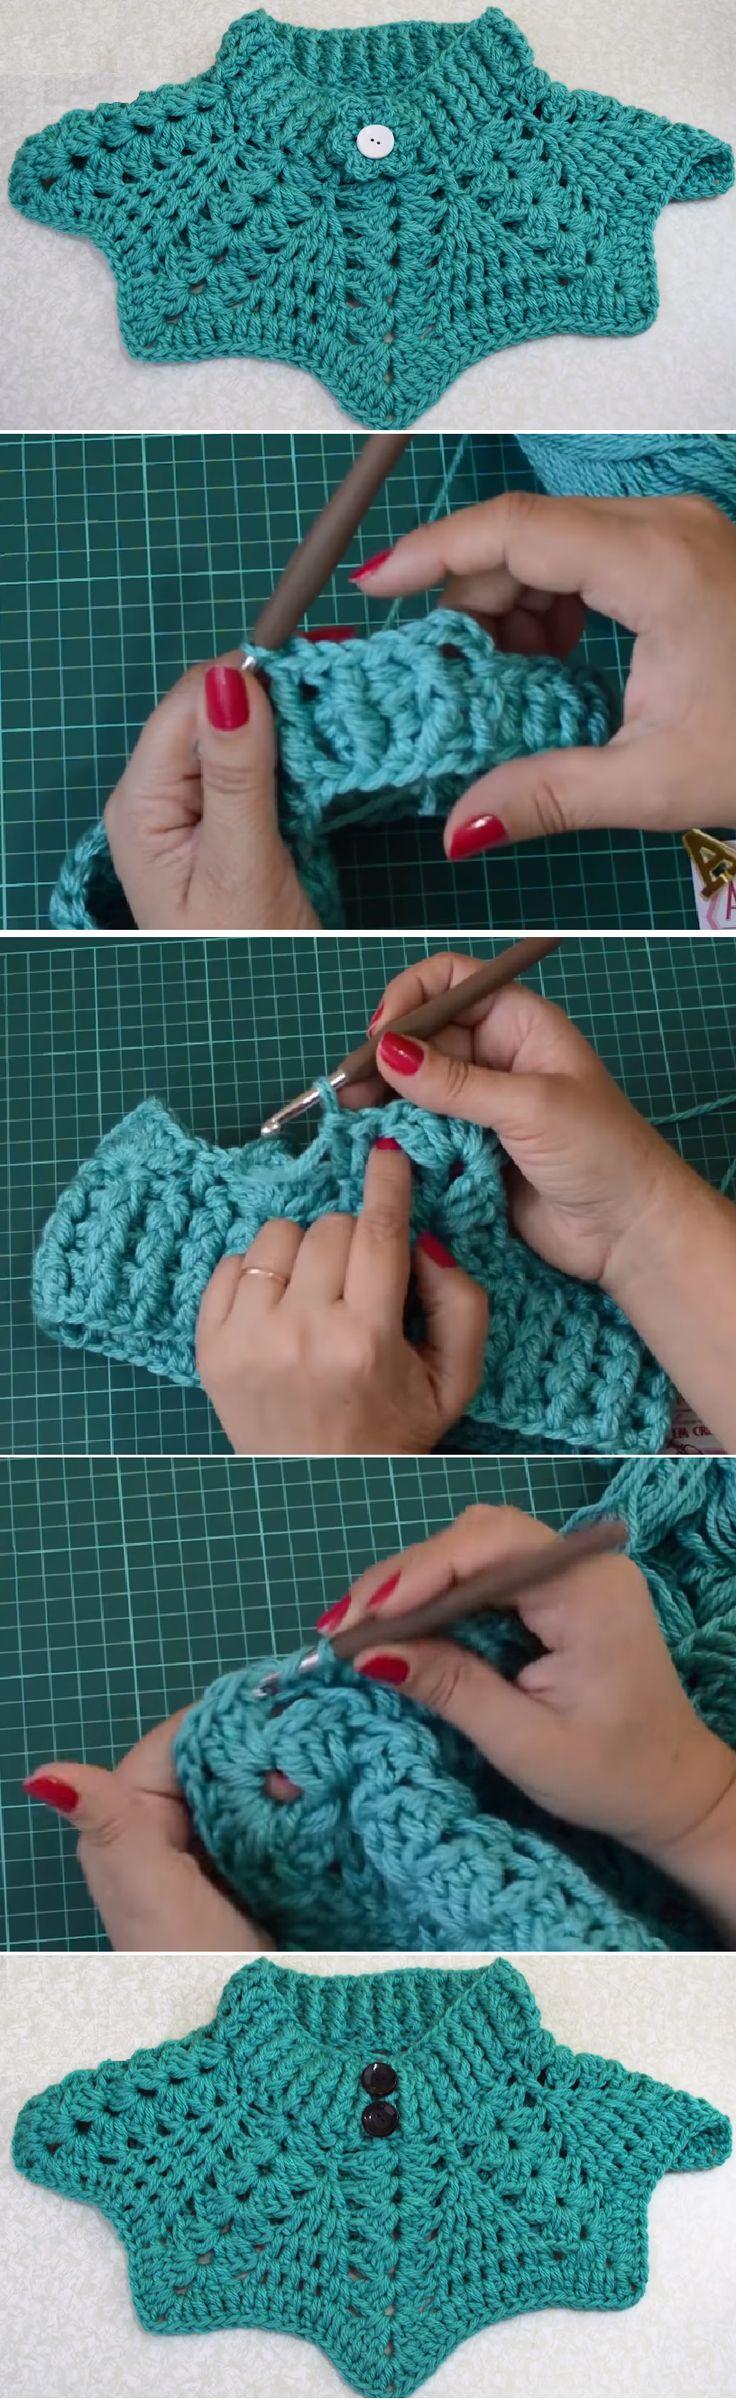 Crochet Maxi Collar/Poncho Tutorial